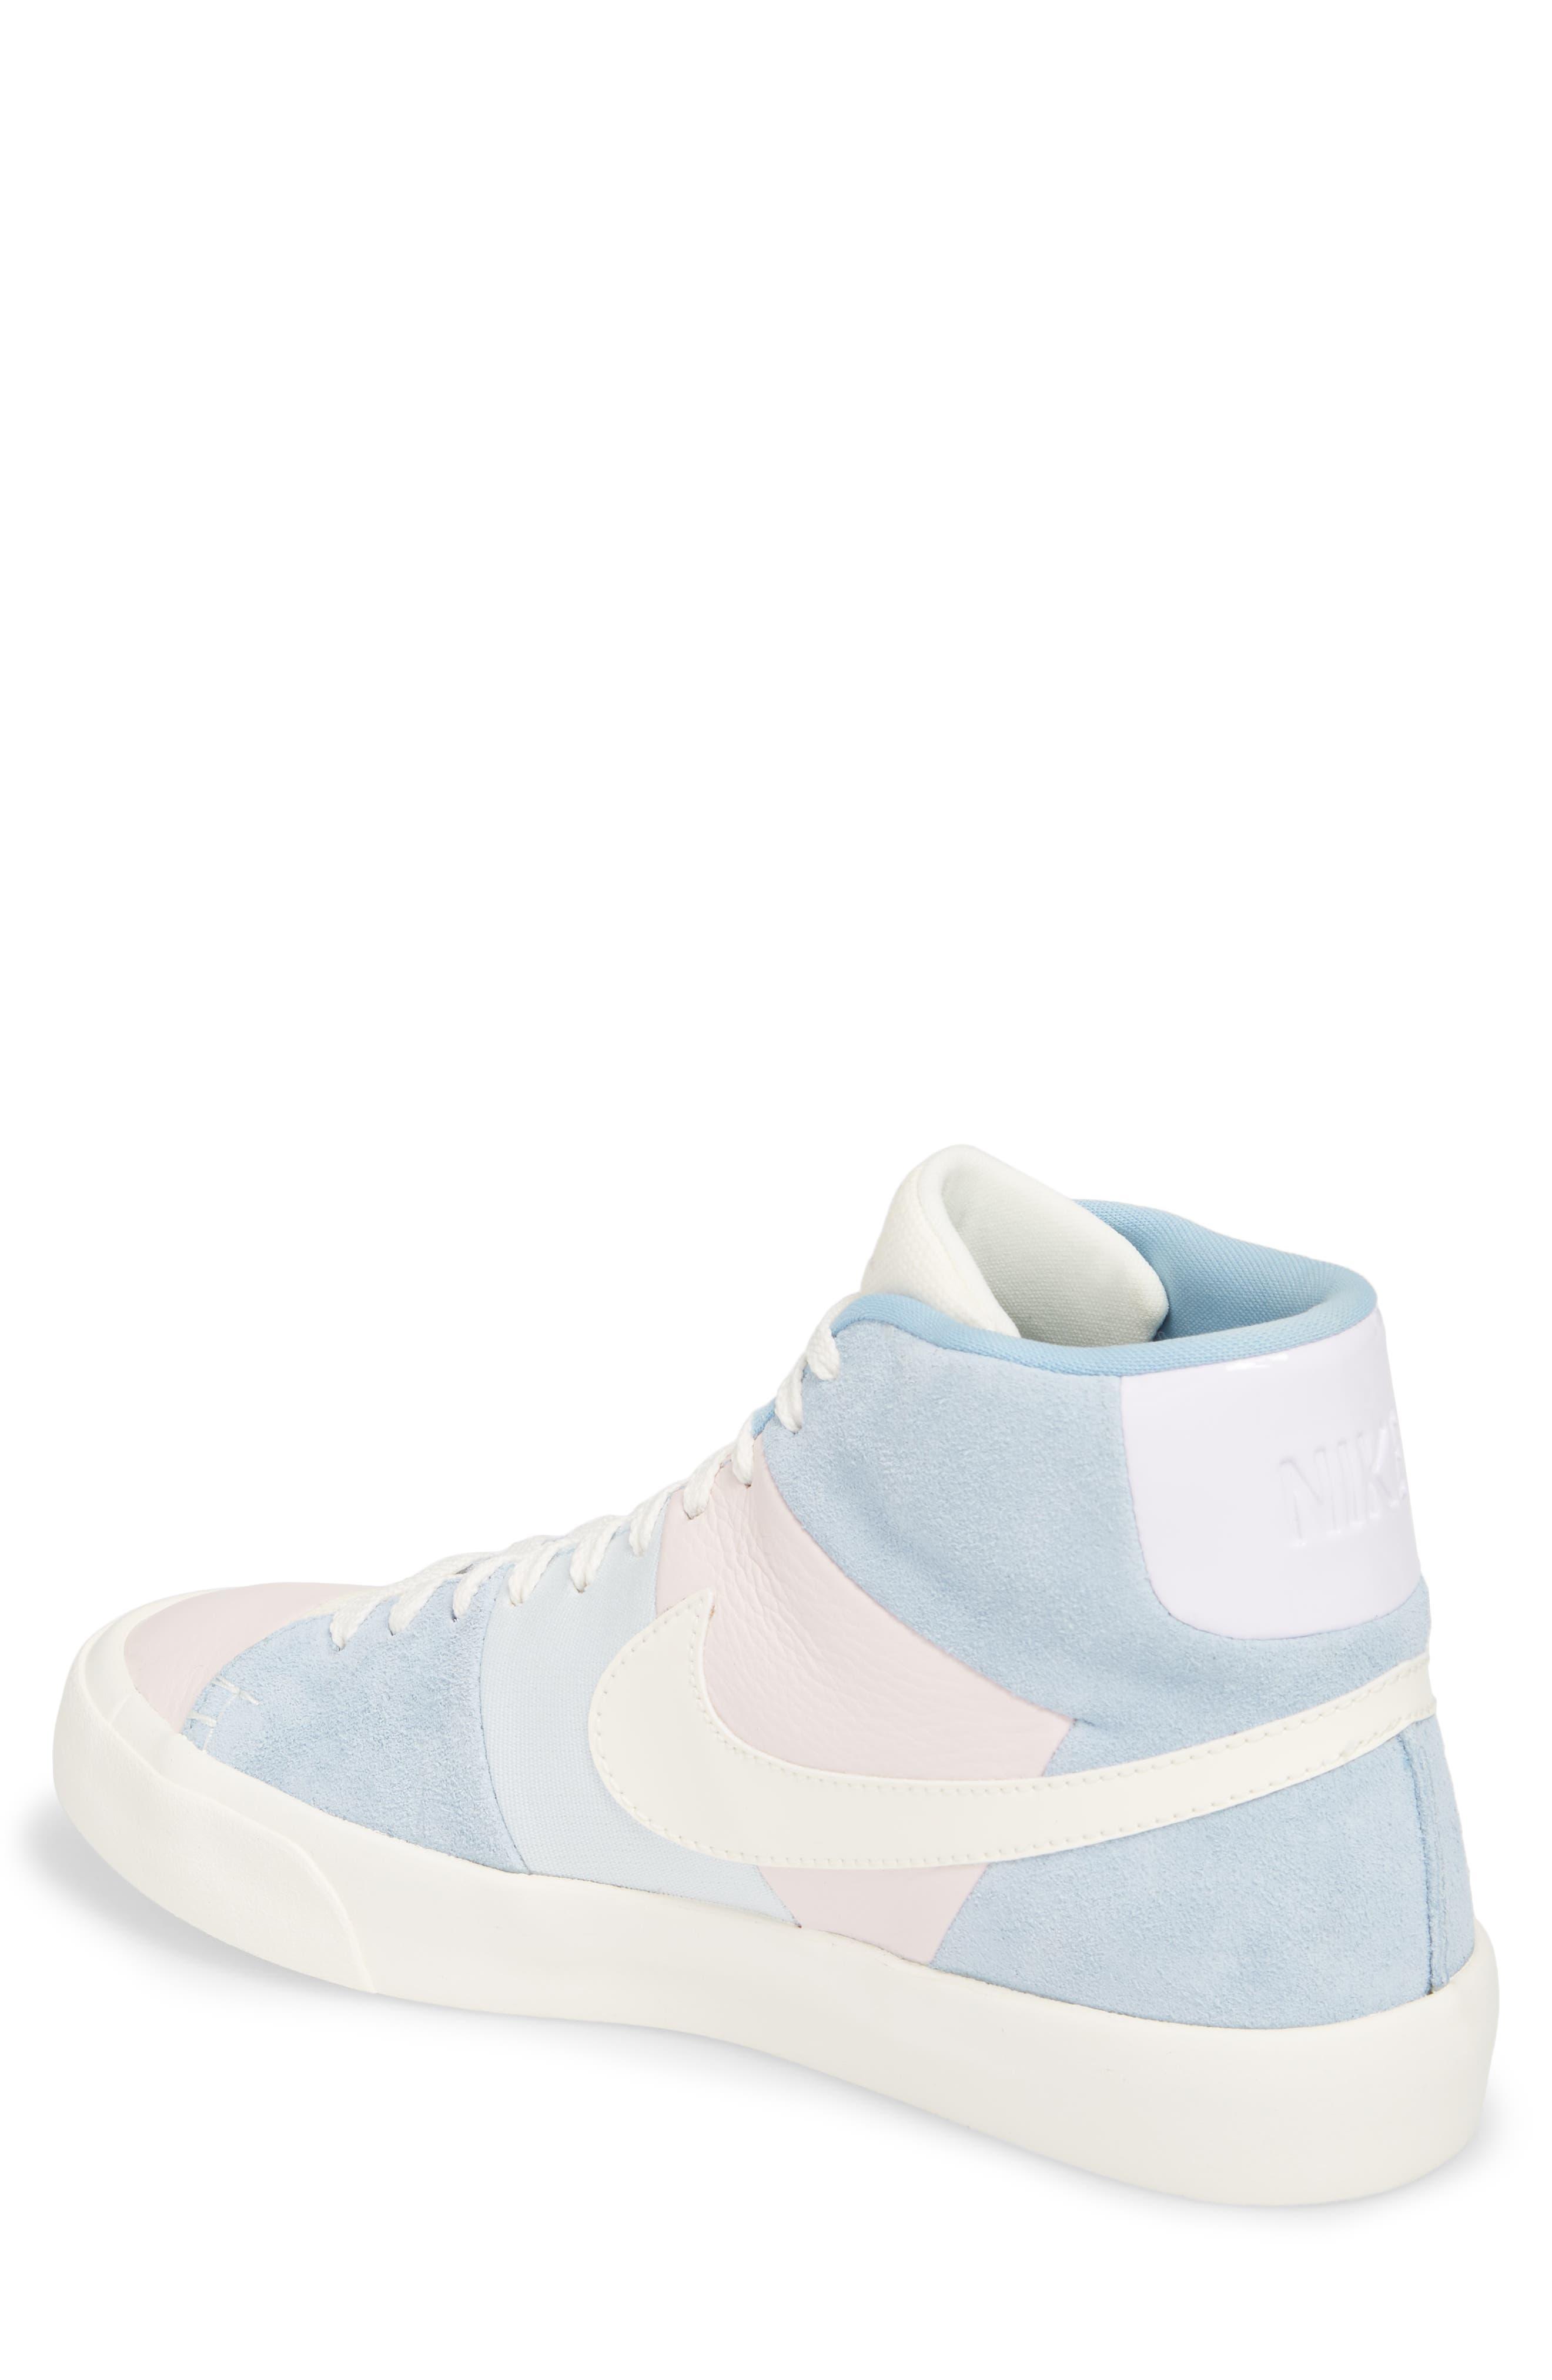 Blazer Royal Easter QS High Top Sneaker,                             Alternate thumbnail 2, color,                             650